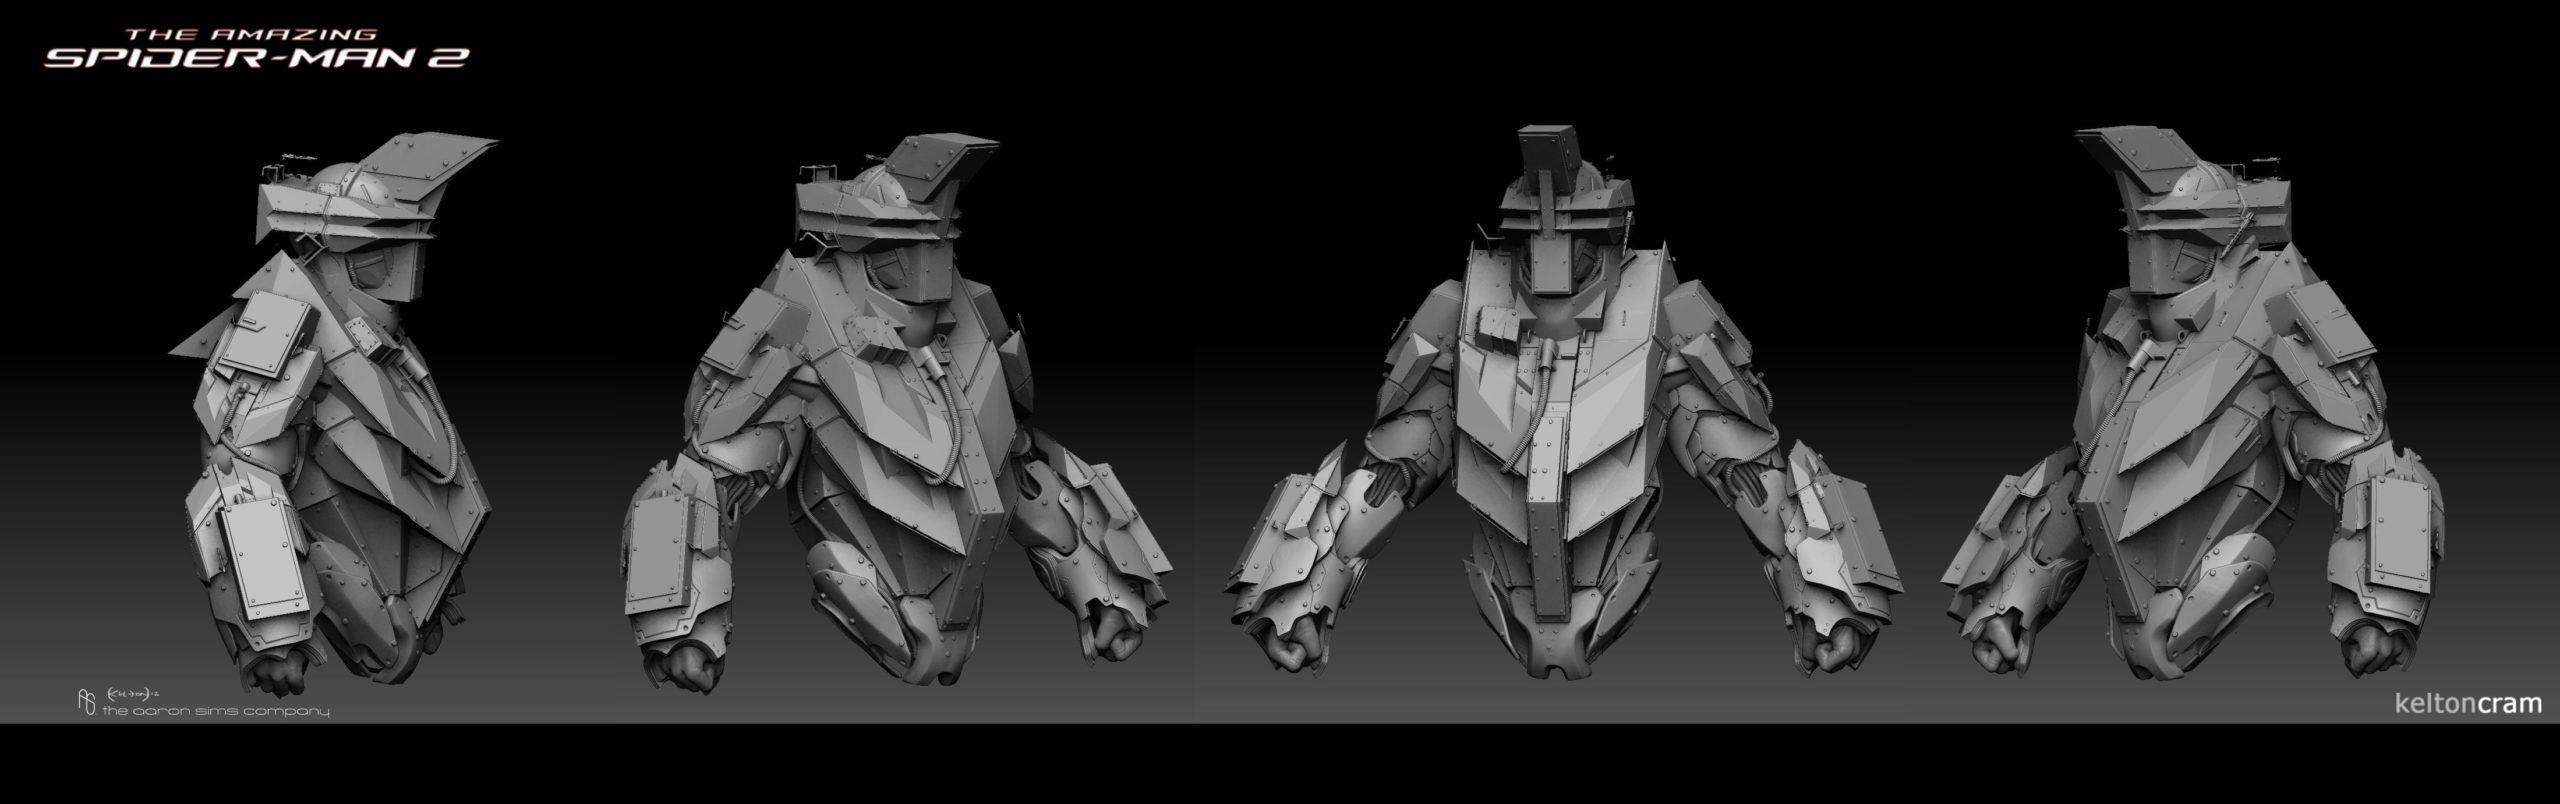 Rhino Concept Art 9